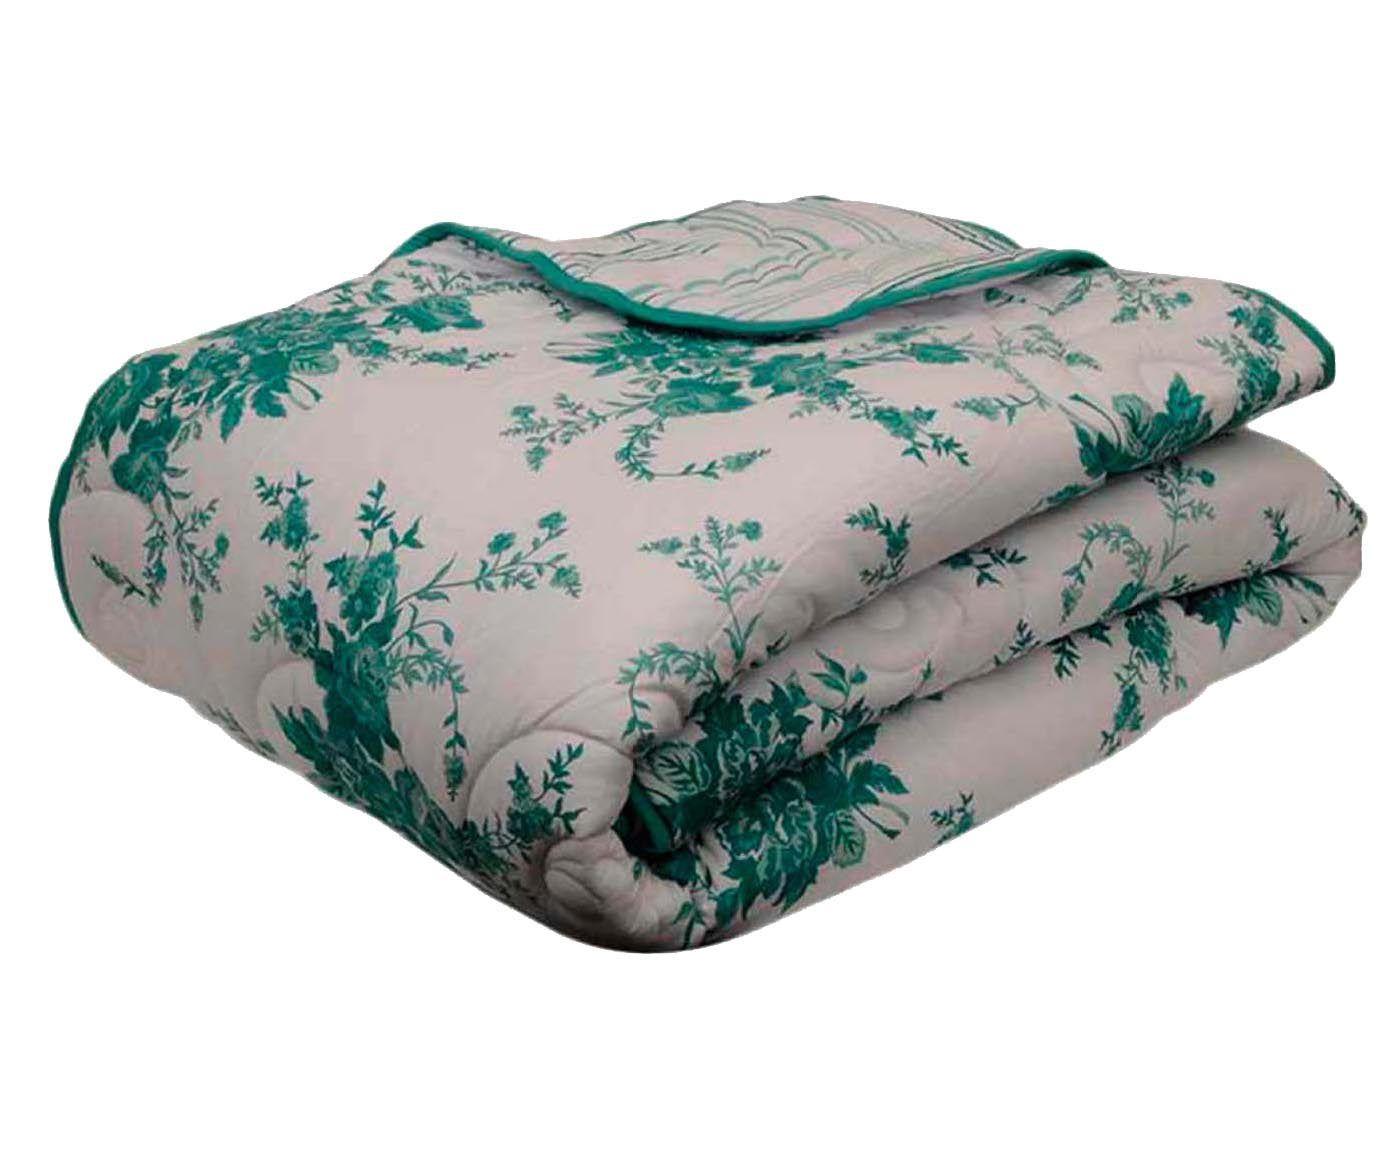 Edredom bouquet - para cama queen size   Westwing.com.br